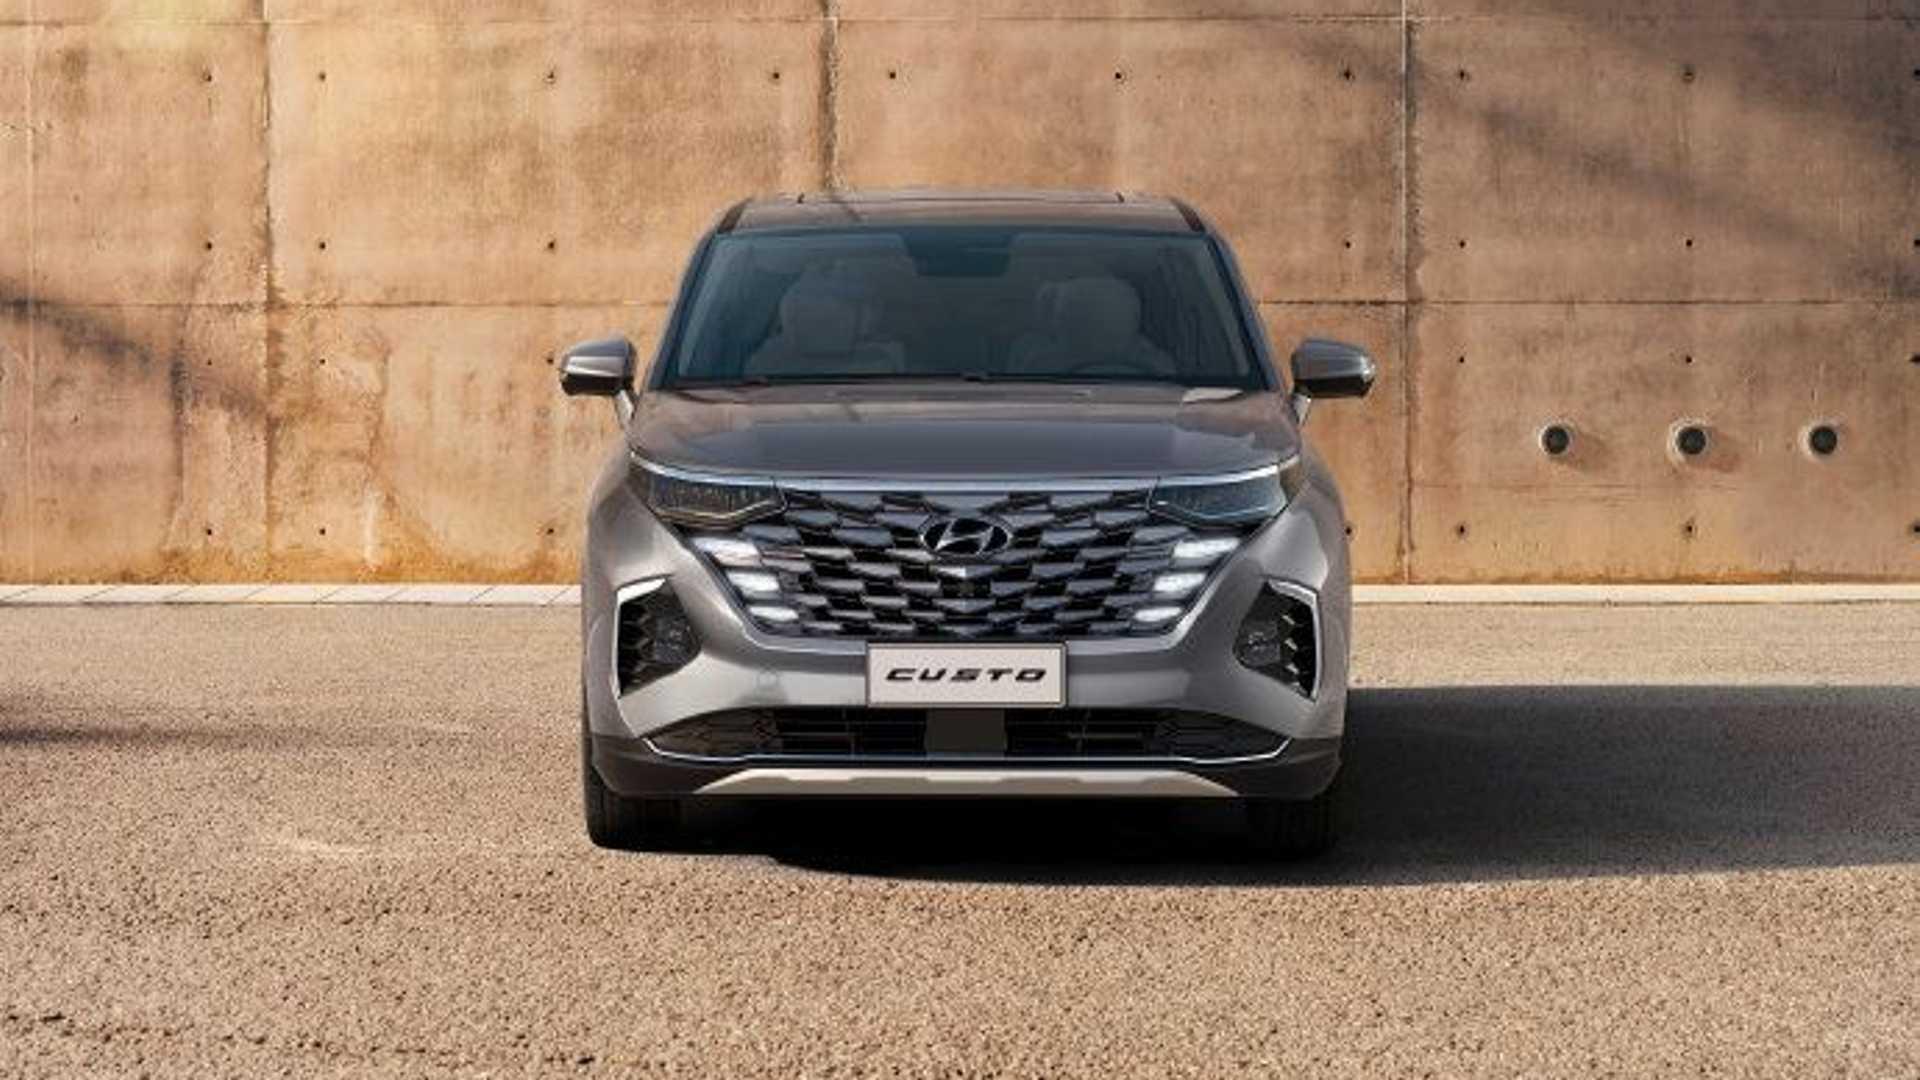 Hyundai-Custo-photos-1